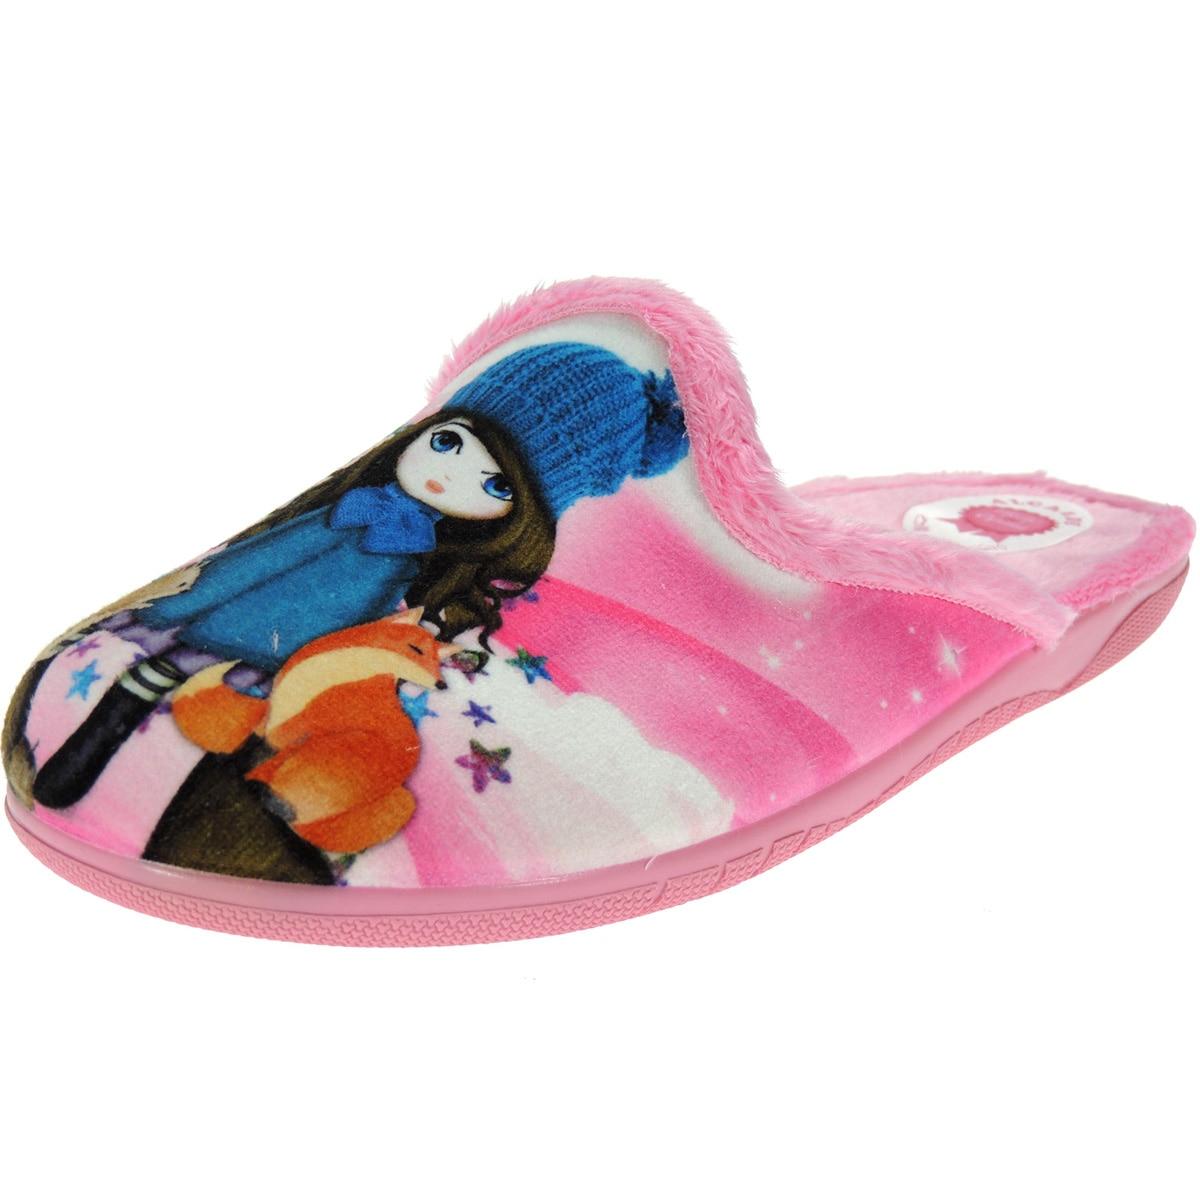 UTMOST 6075 Chinela Slipper Undercut House Winter Girl Fox And Squirrel For Girl